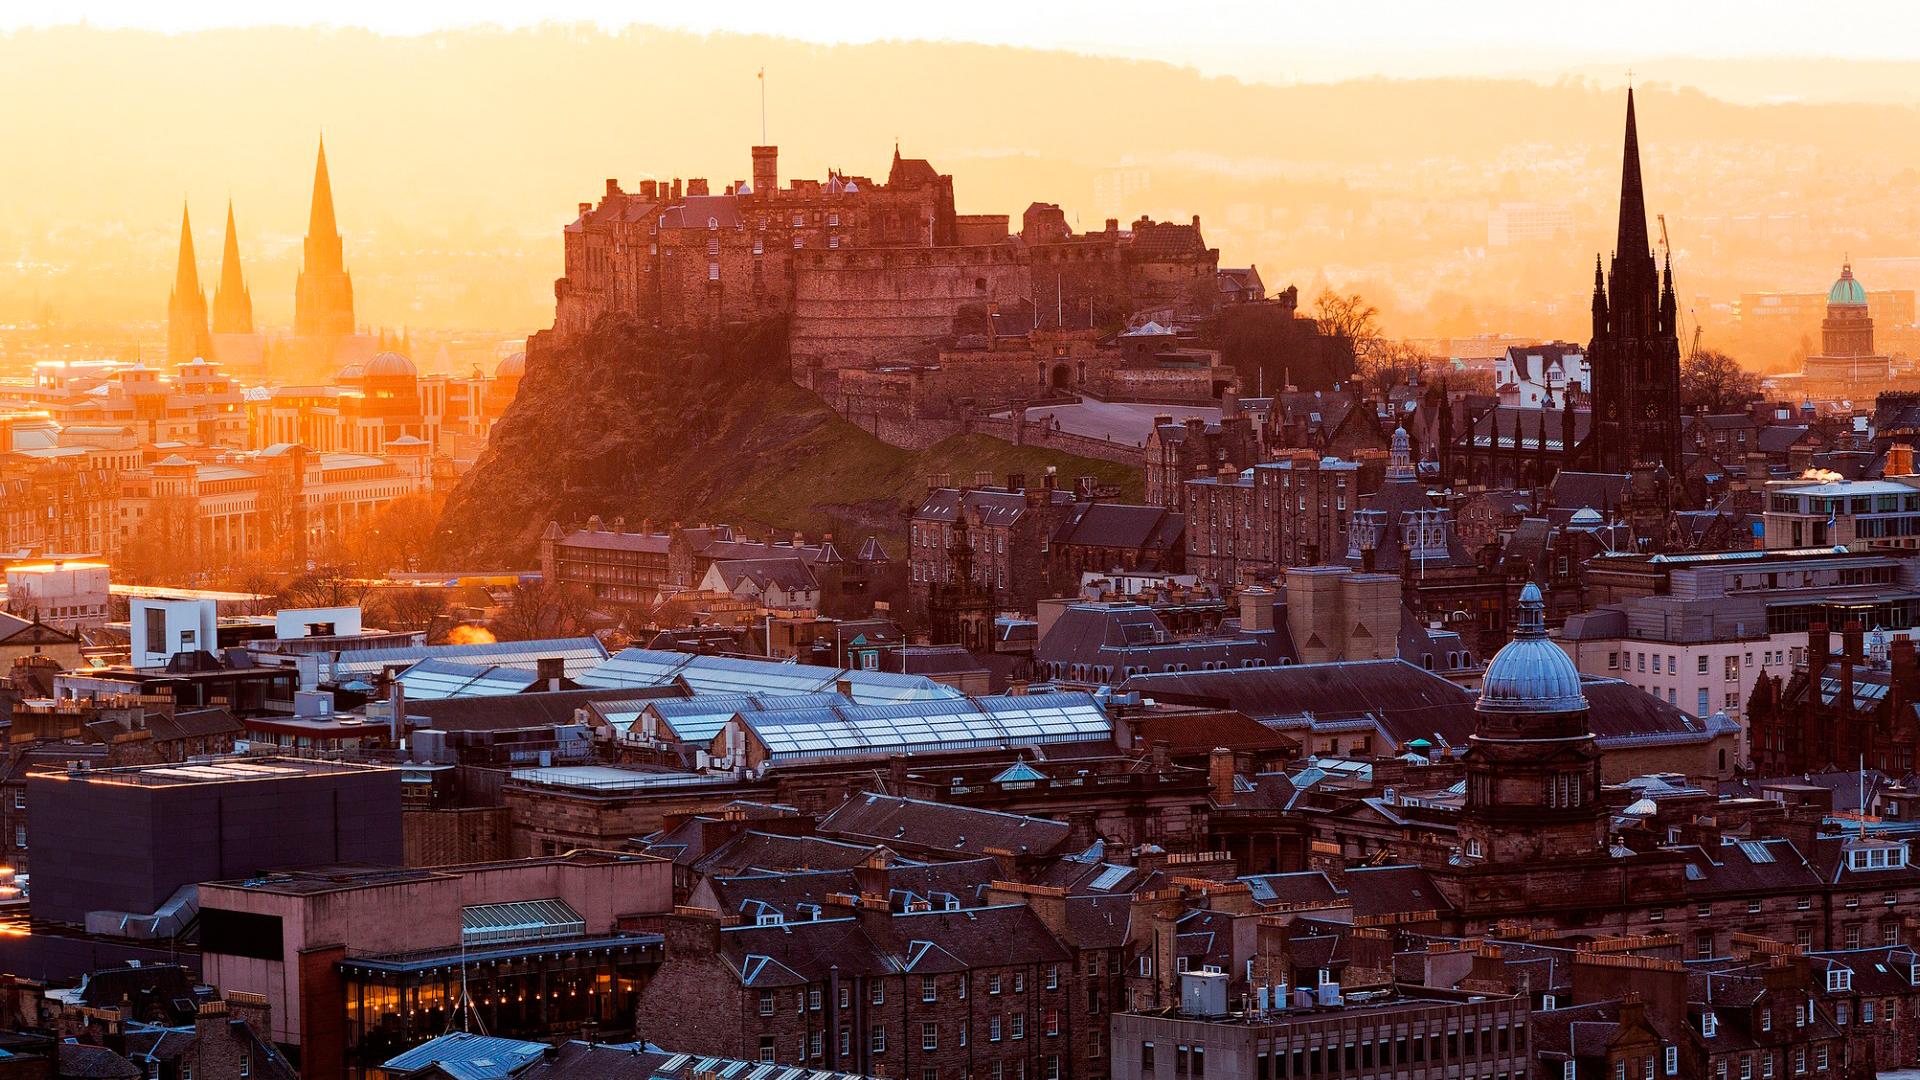 Обои dugald stewart monument, scotland, Шотландия, эдинбург, edinburgh, calton hill. Города foto 12